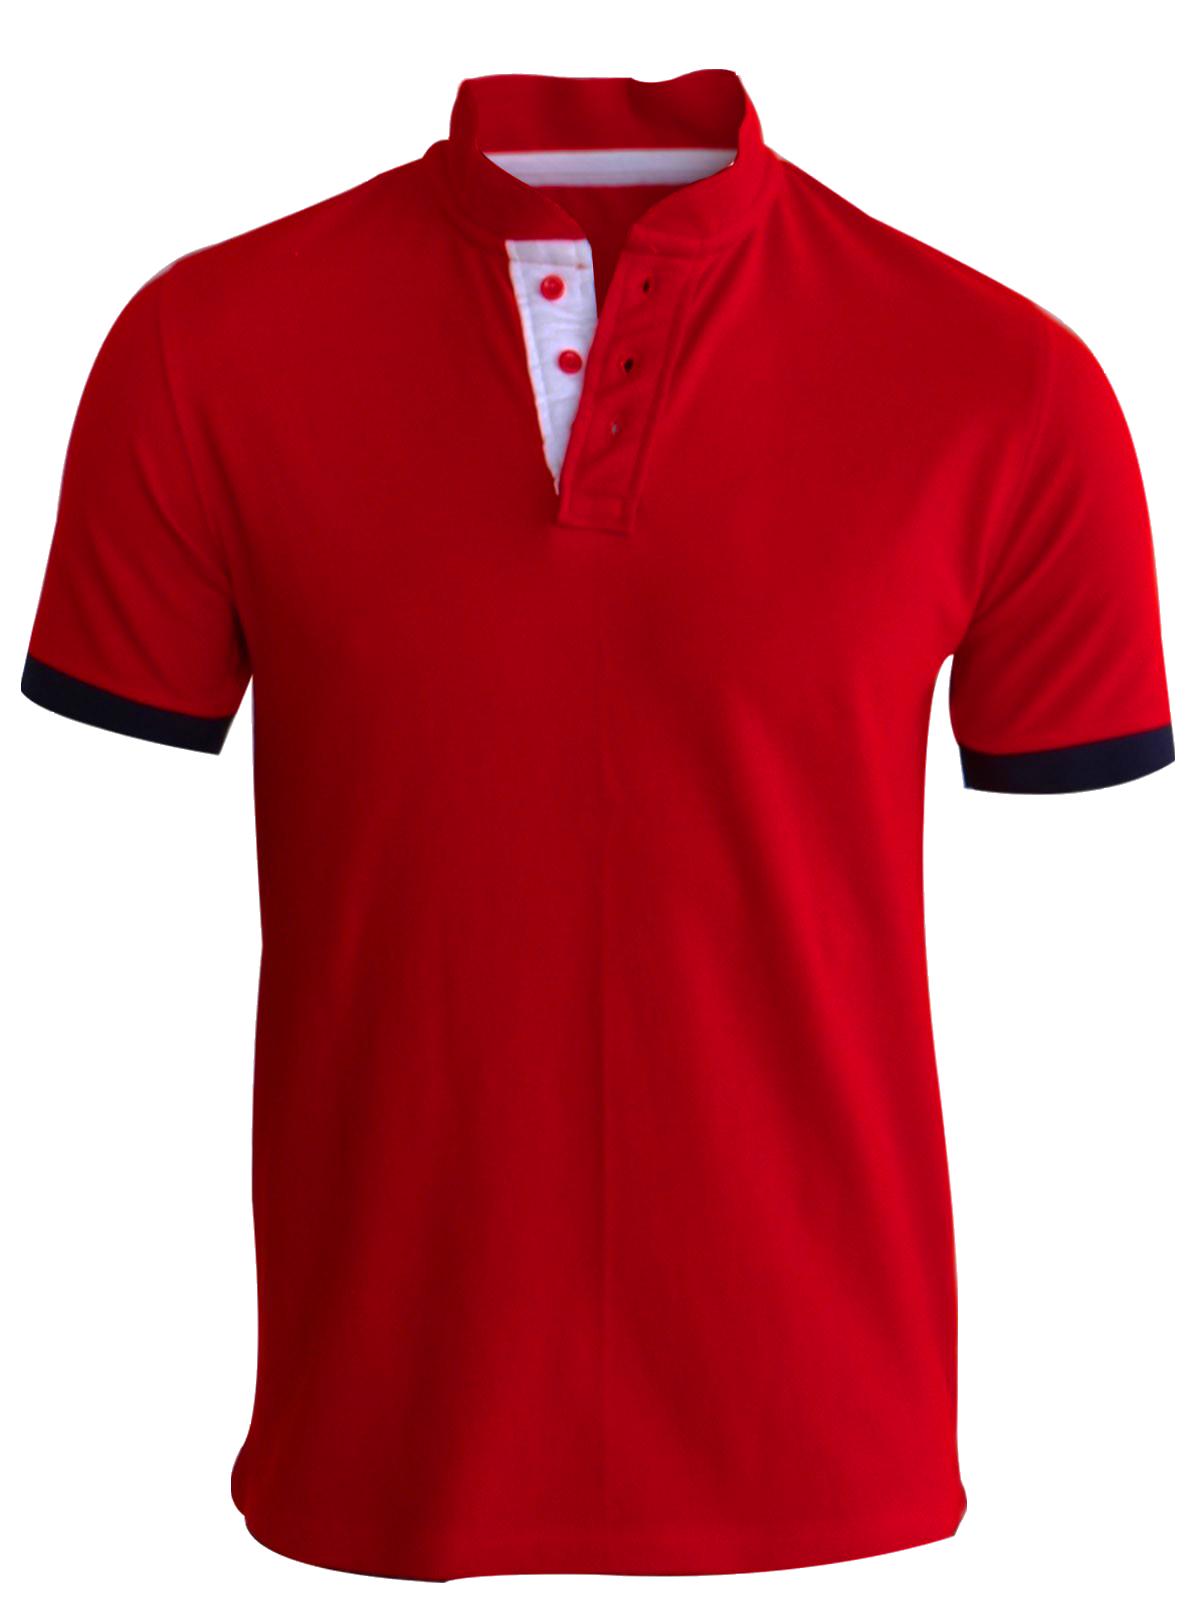 Clipart shirt pent shirt. Dress png images pngpix